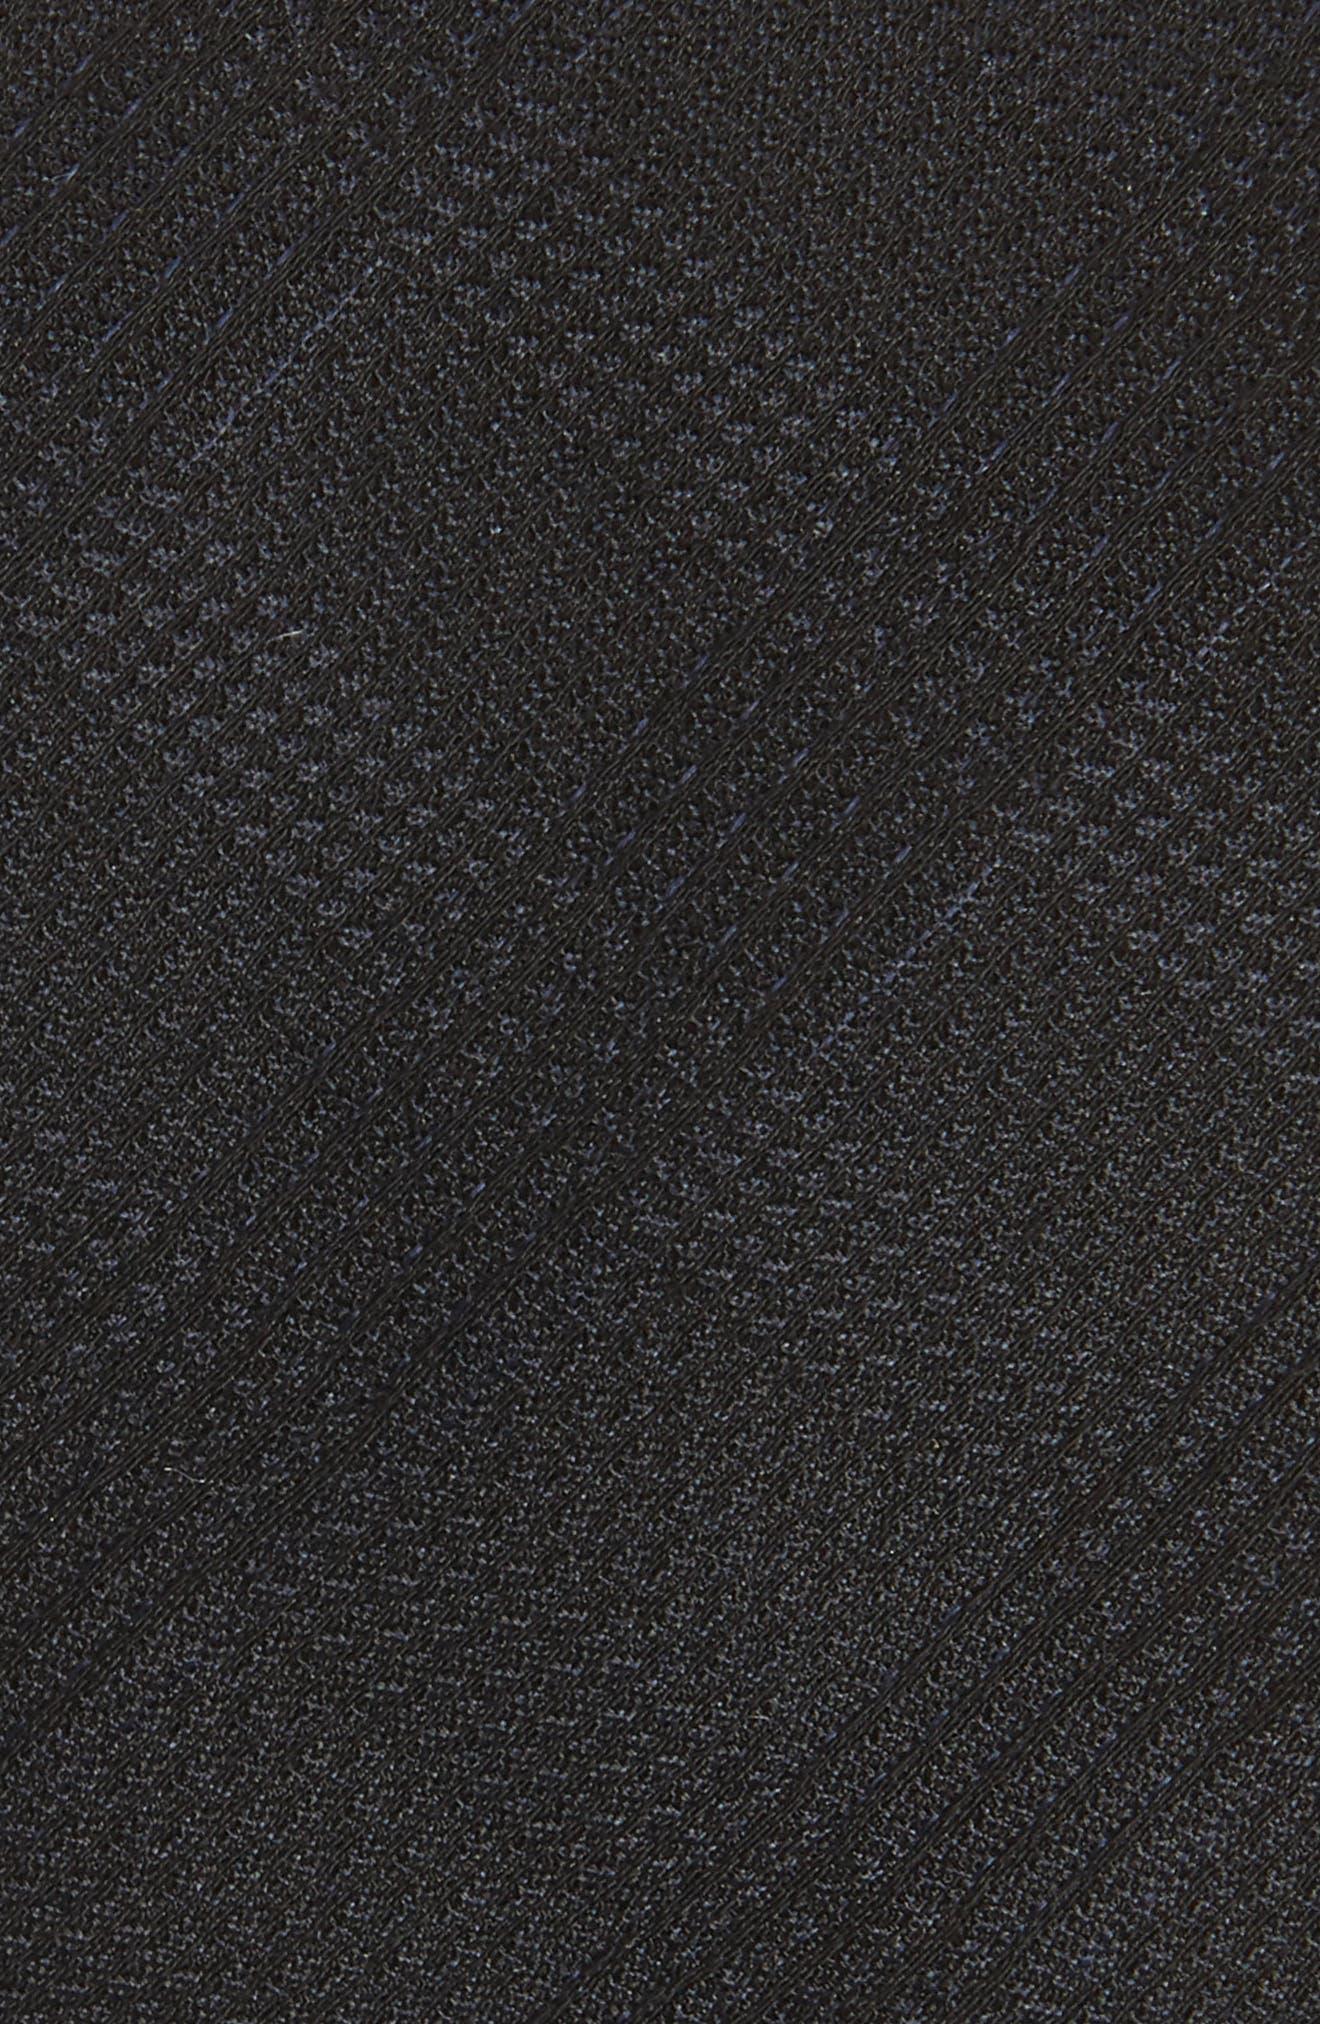 Check Weave Tie,                             Alternate thumbnail 2, color,                             Black